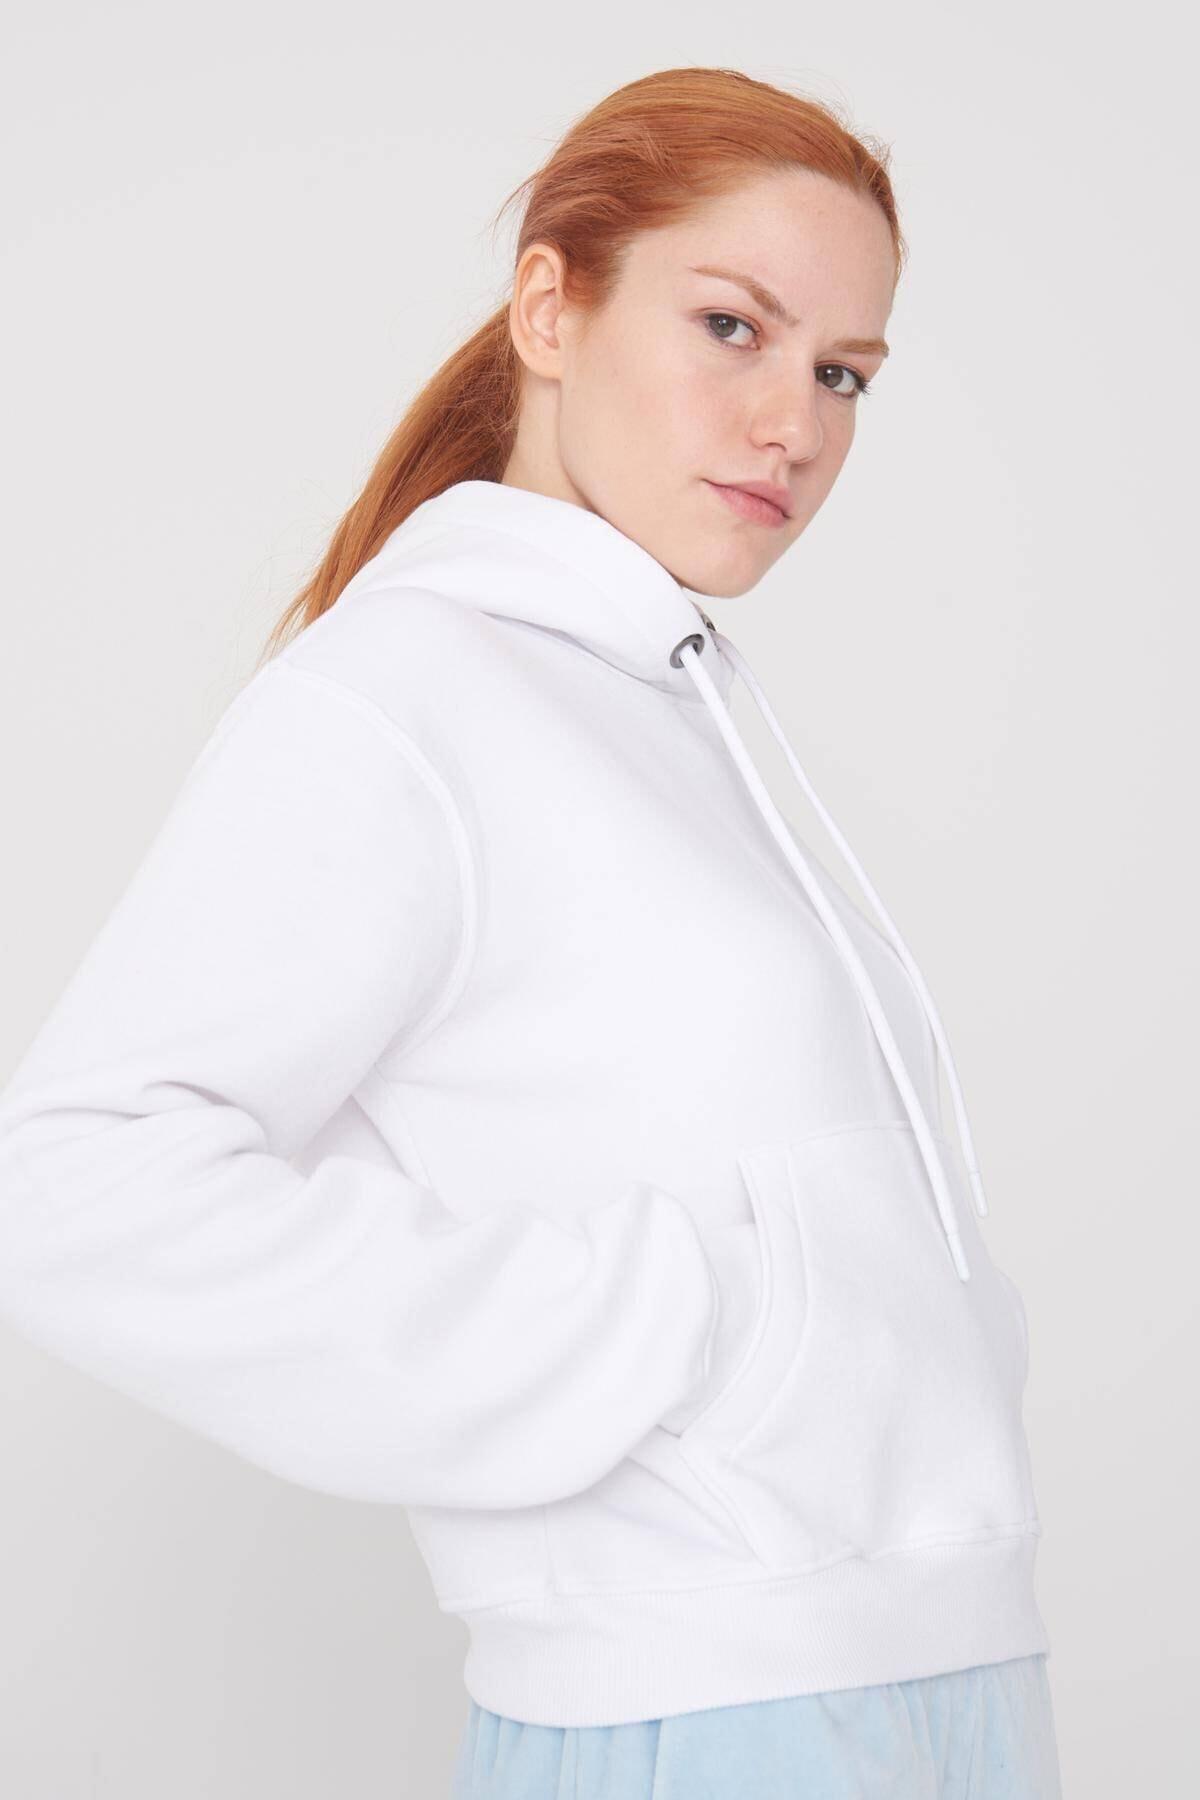 Addax Kadın Beyaz Cep Detaylı Sweat S0818 - F11 ADX-0000021306 2